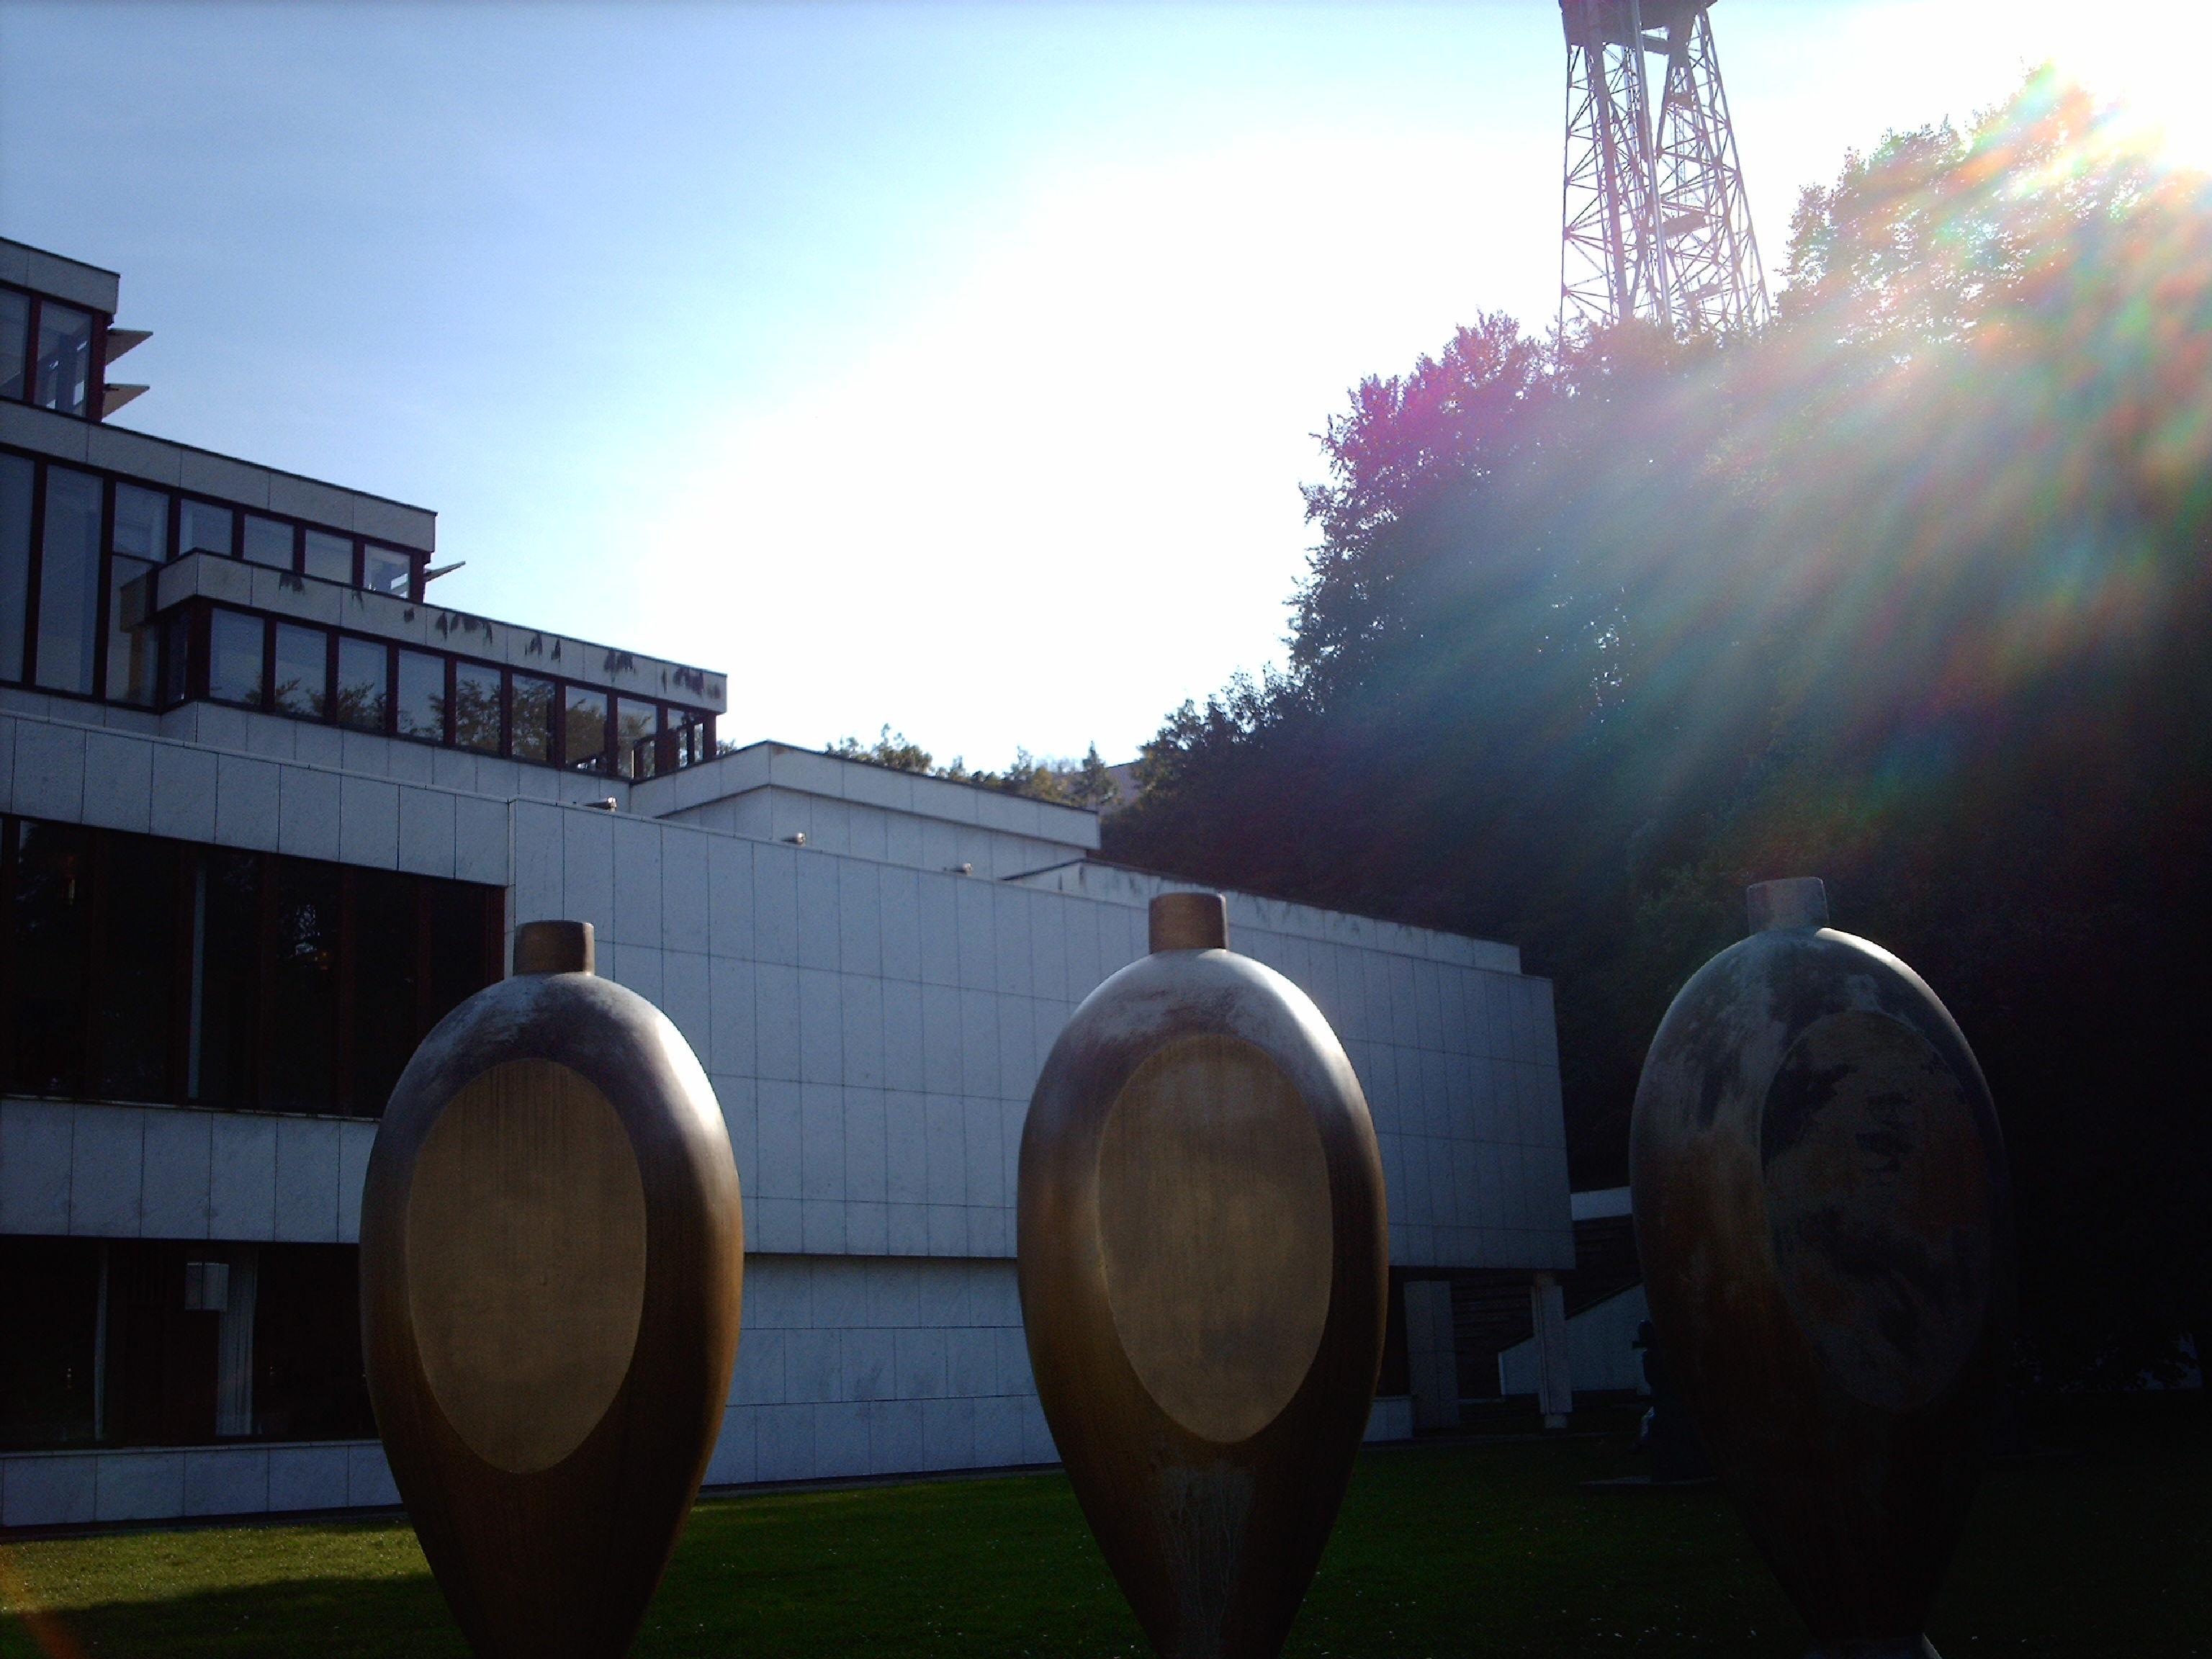 parque de esculturas